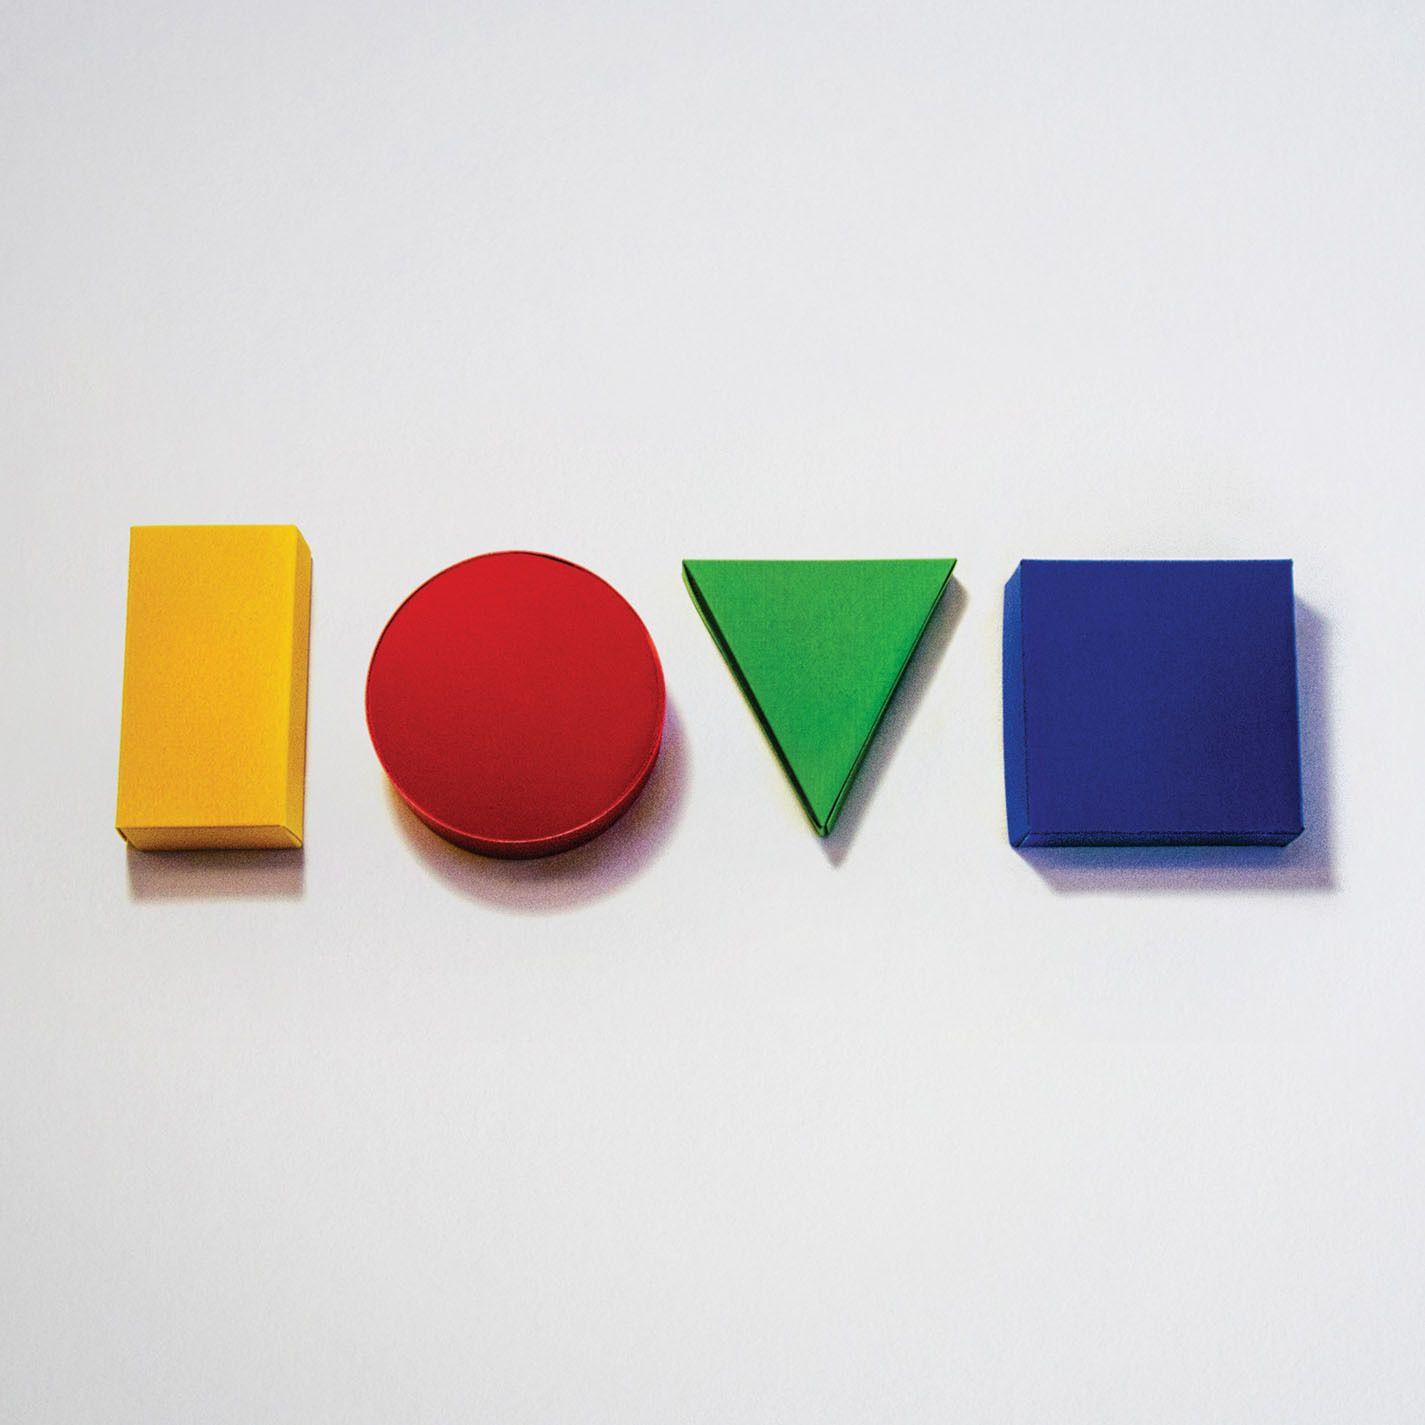 Jason Mraz - Love Is A Four Letter Word album cover